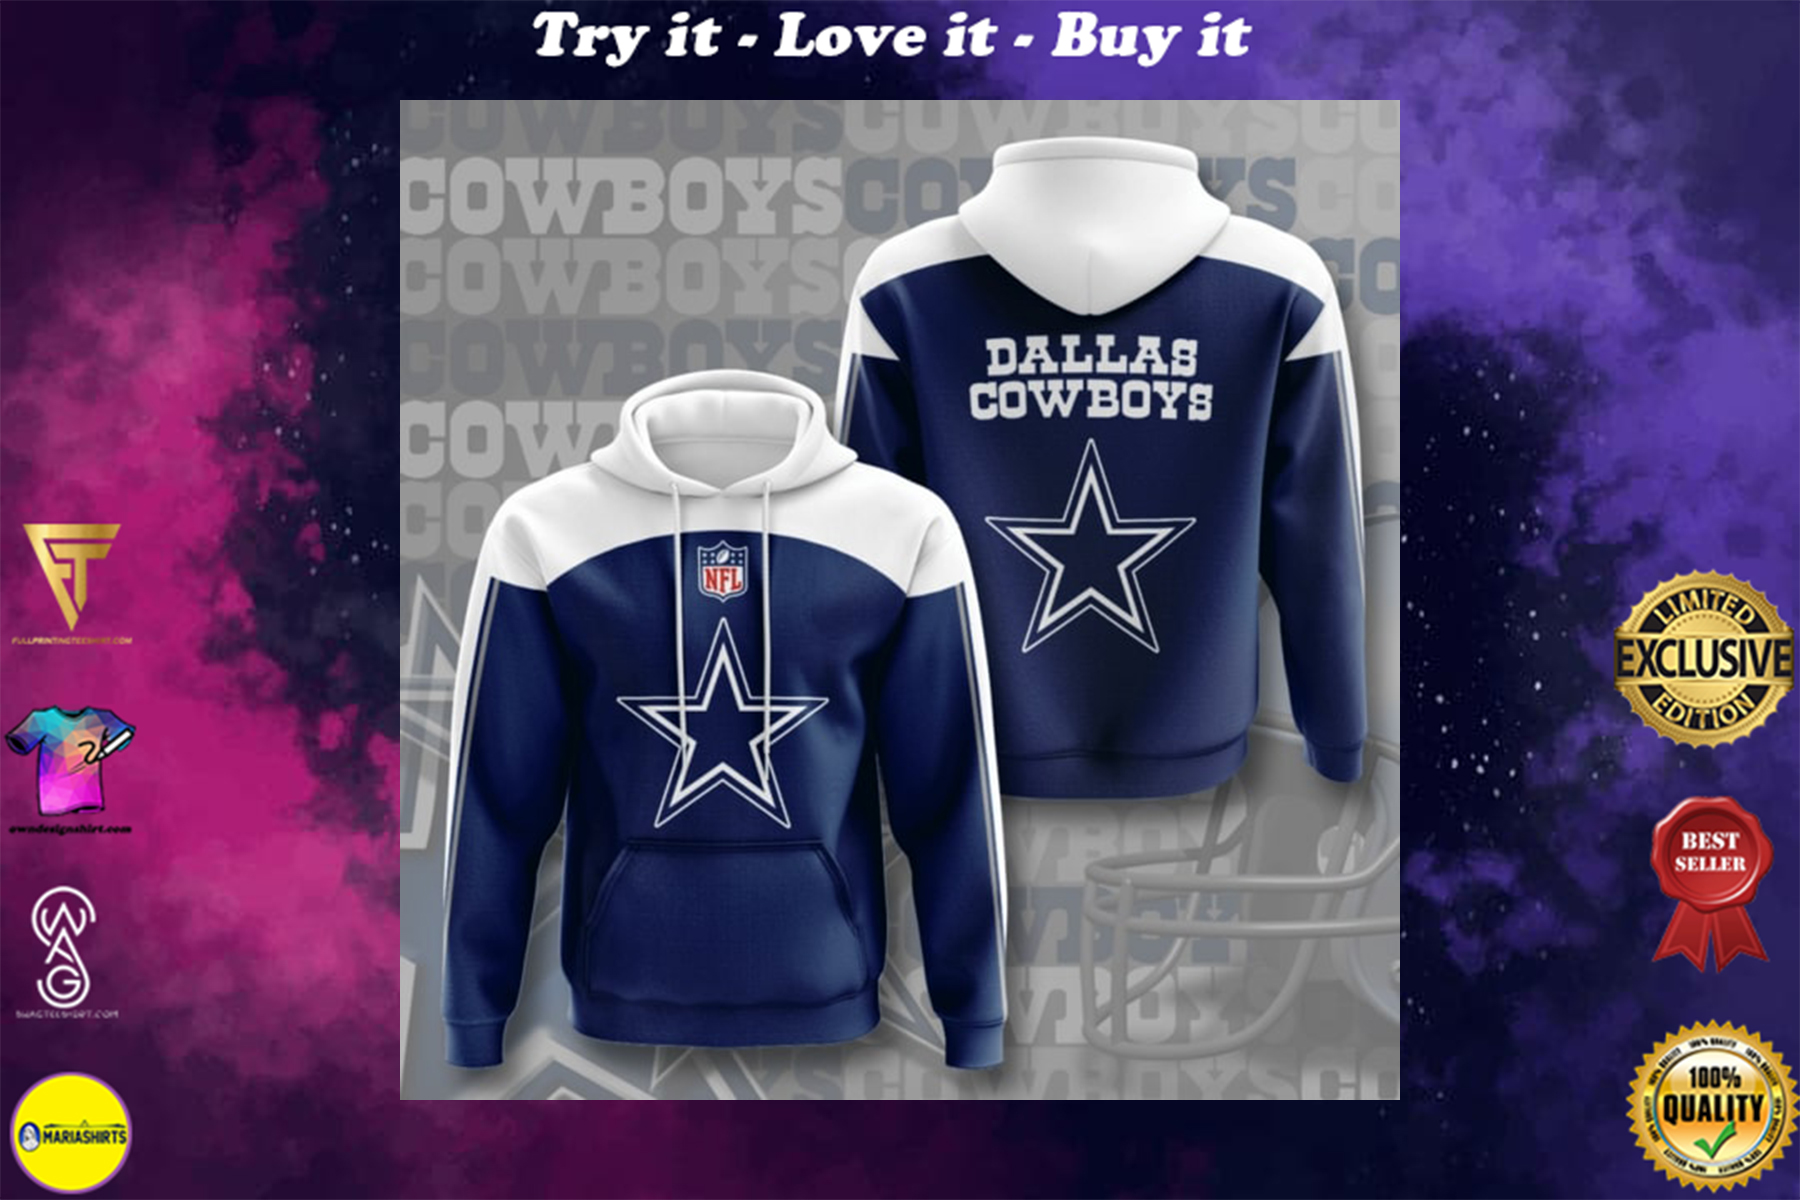 [special edition] the dallas cowboys football team full printing shirt - maria